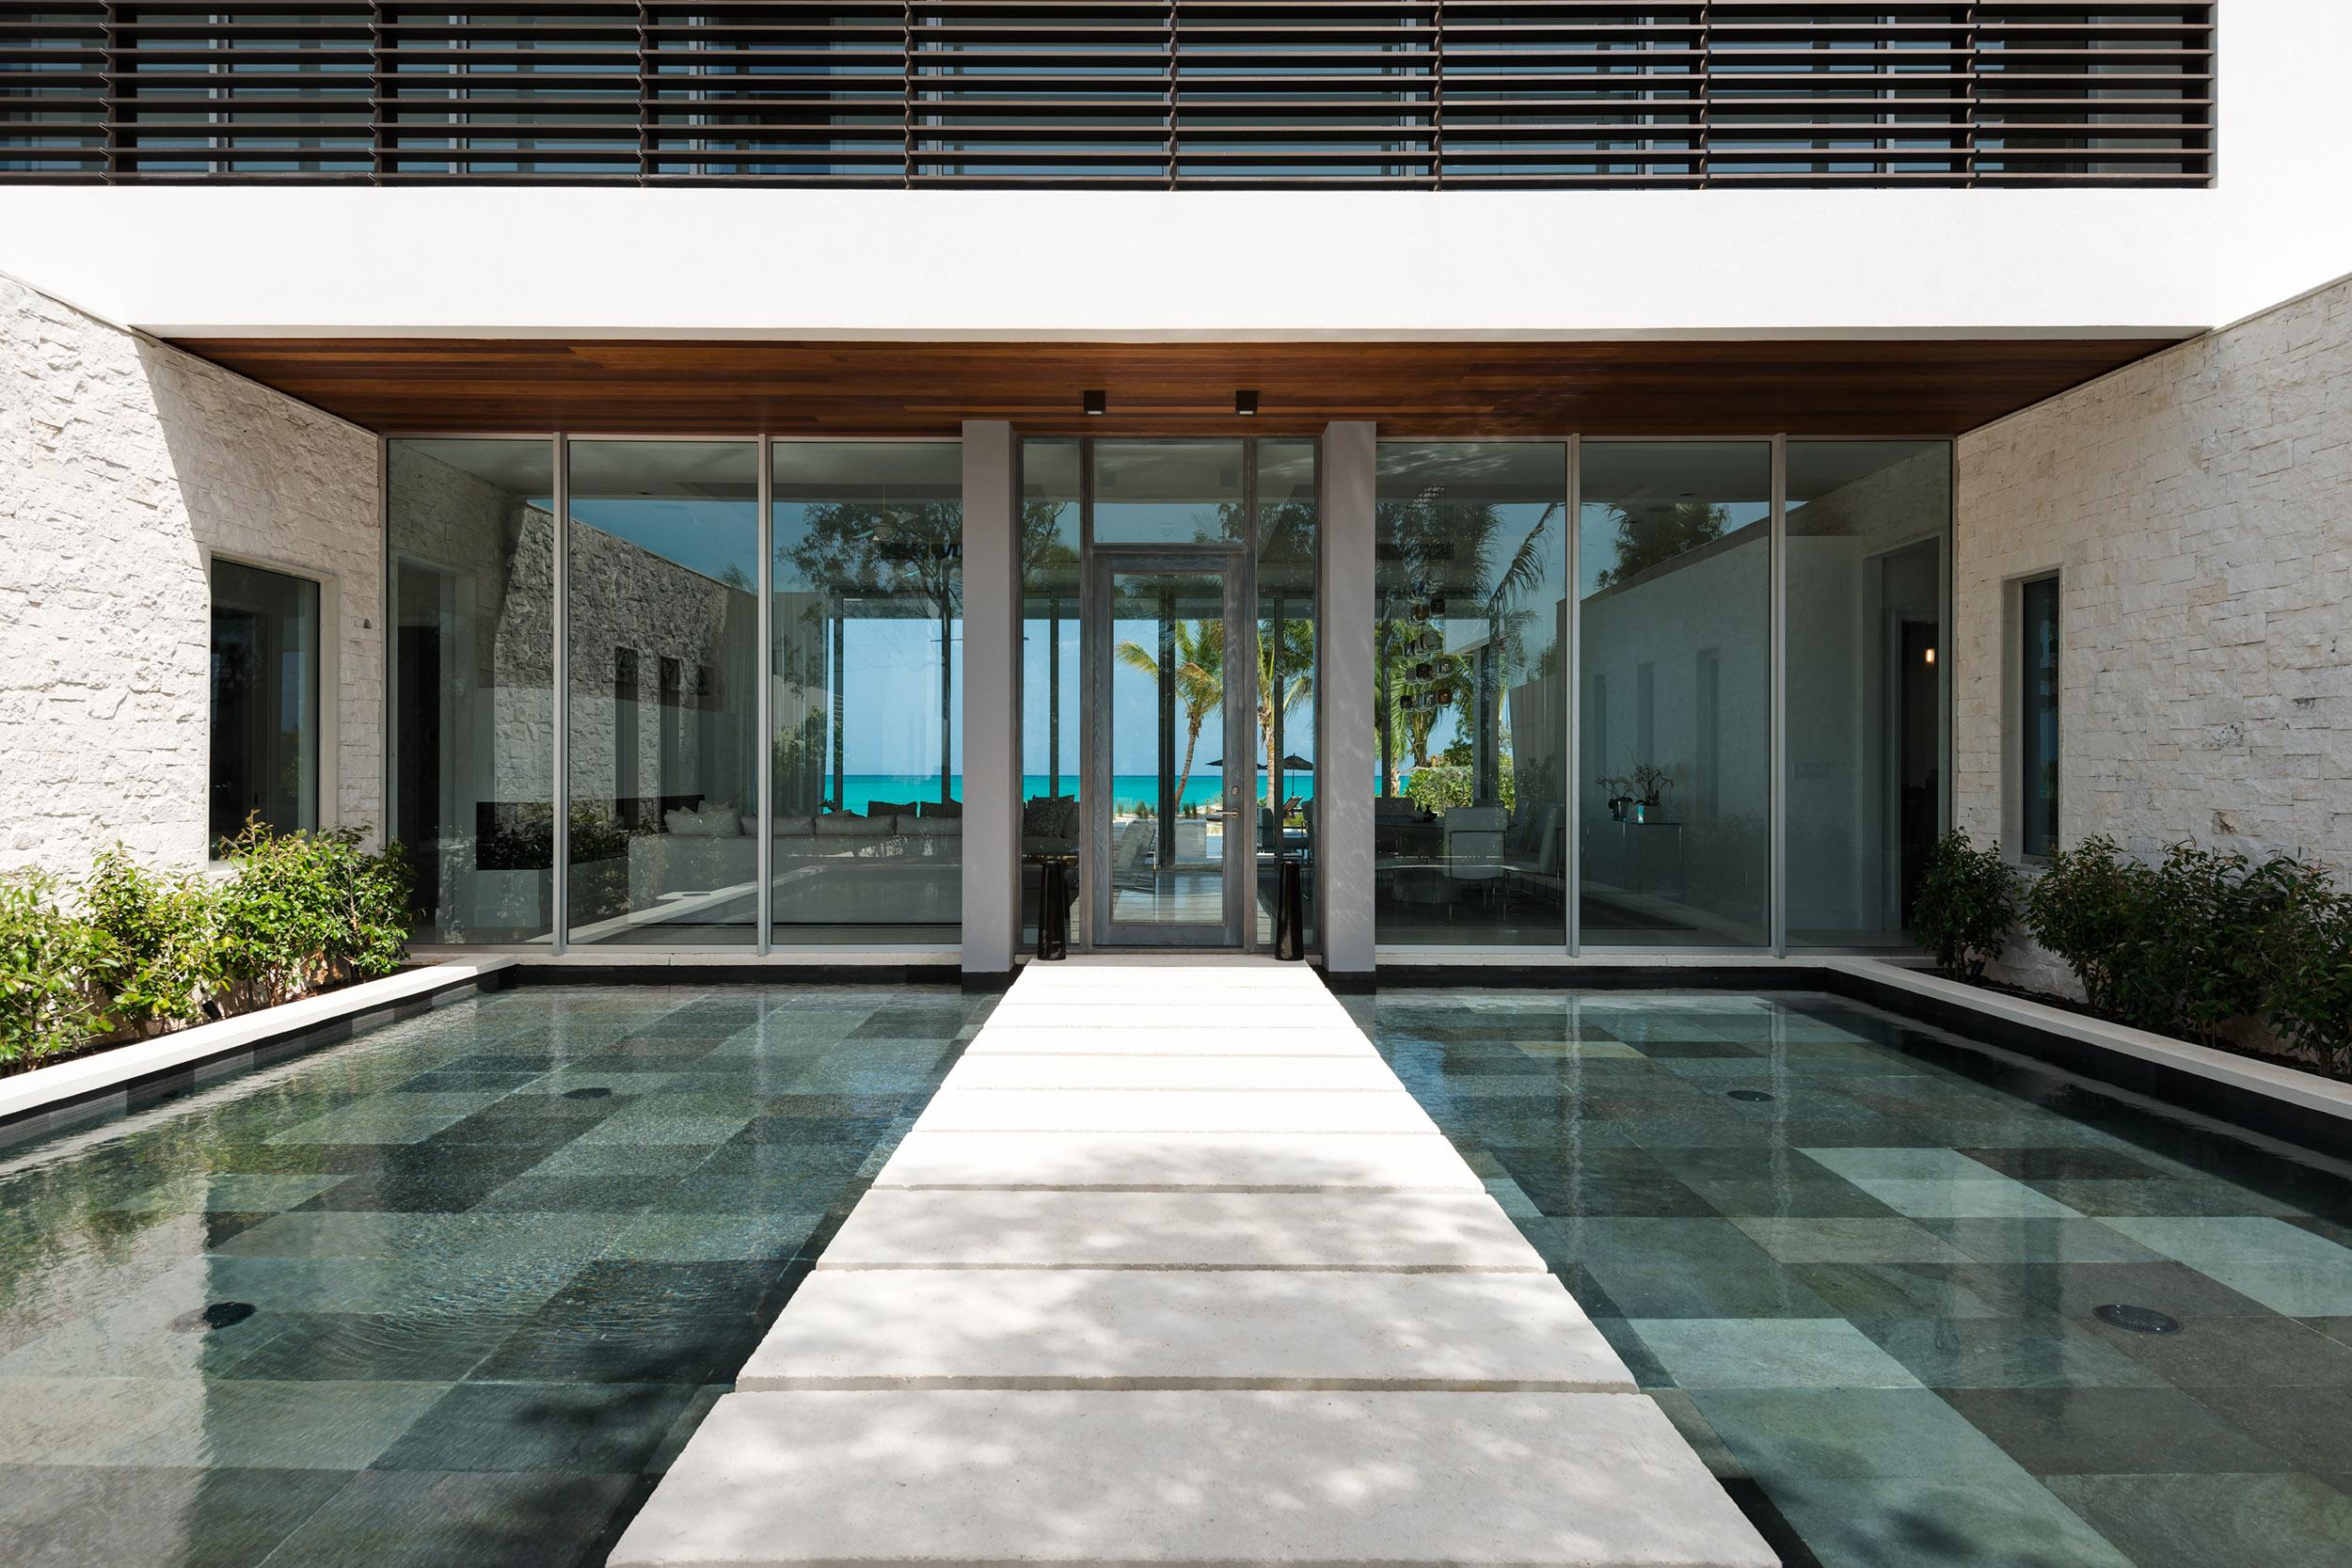 Villa Awa - view of the entrance and the reflecting pools